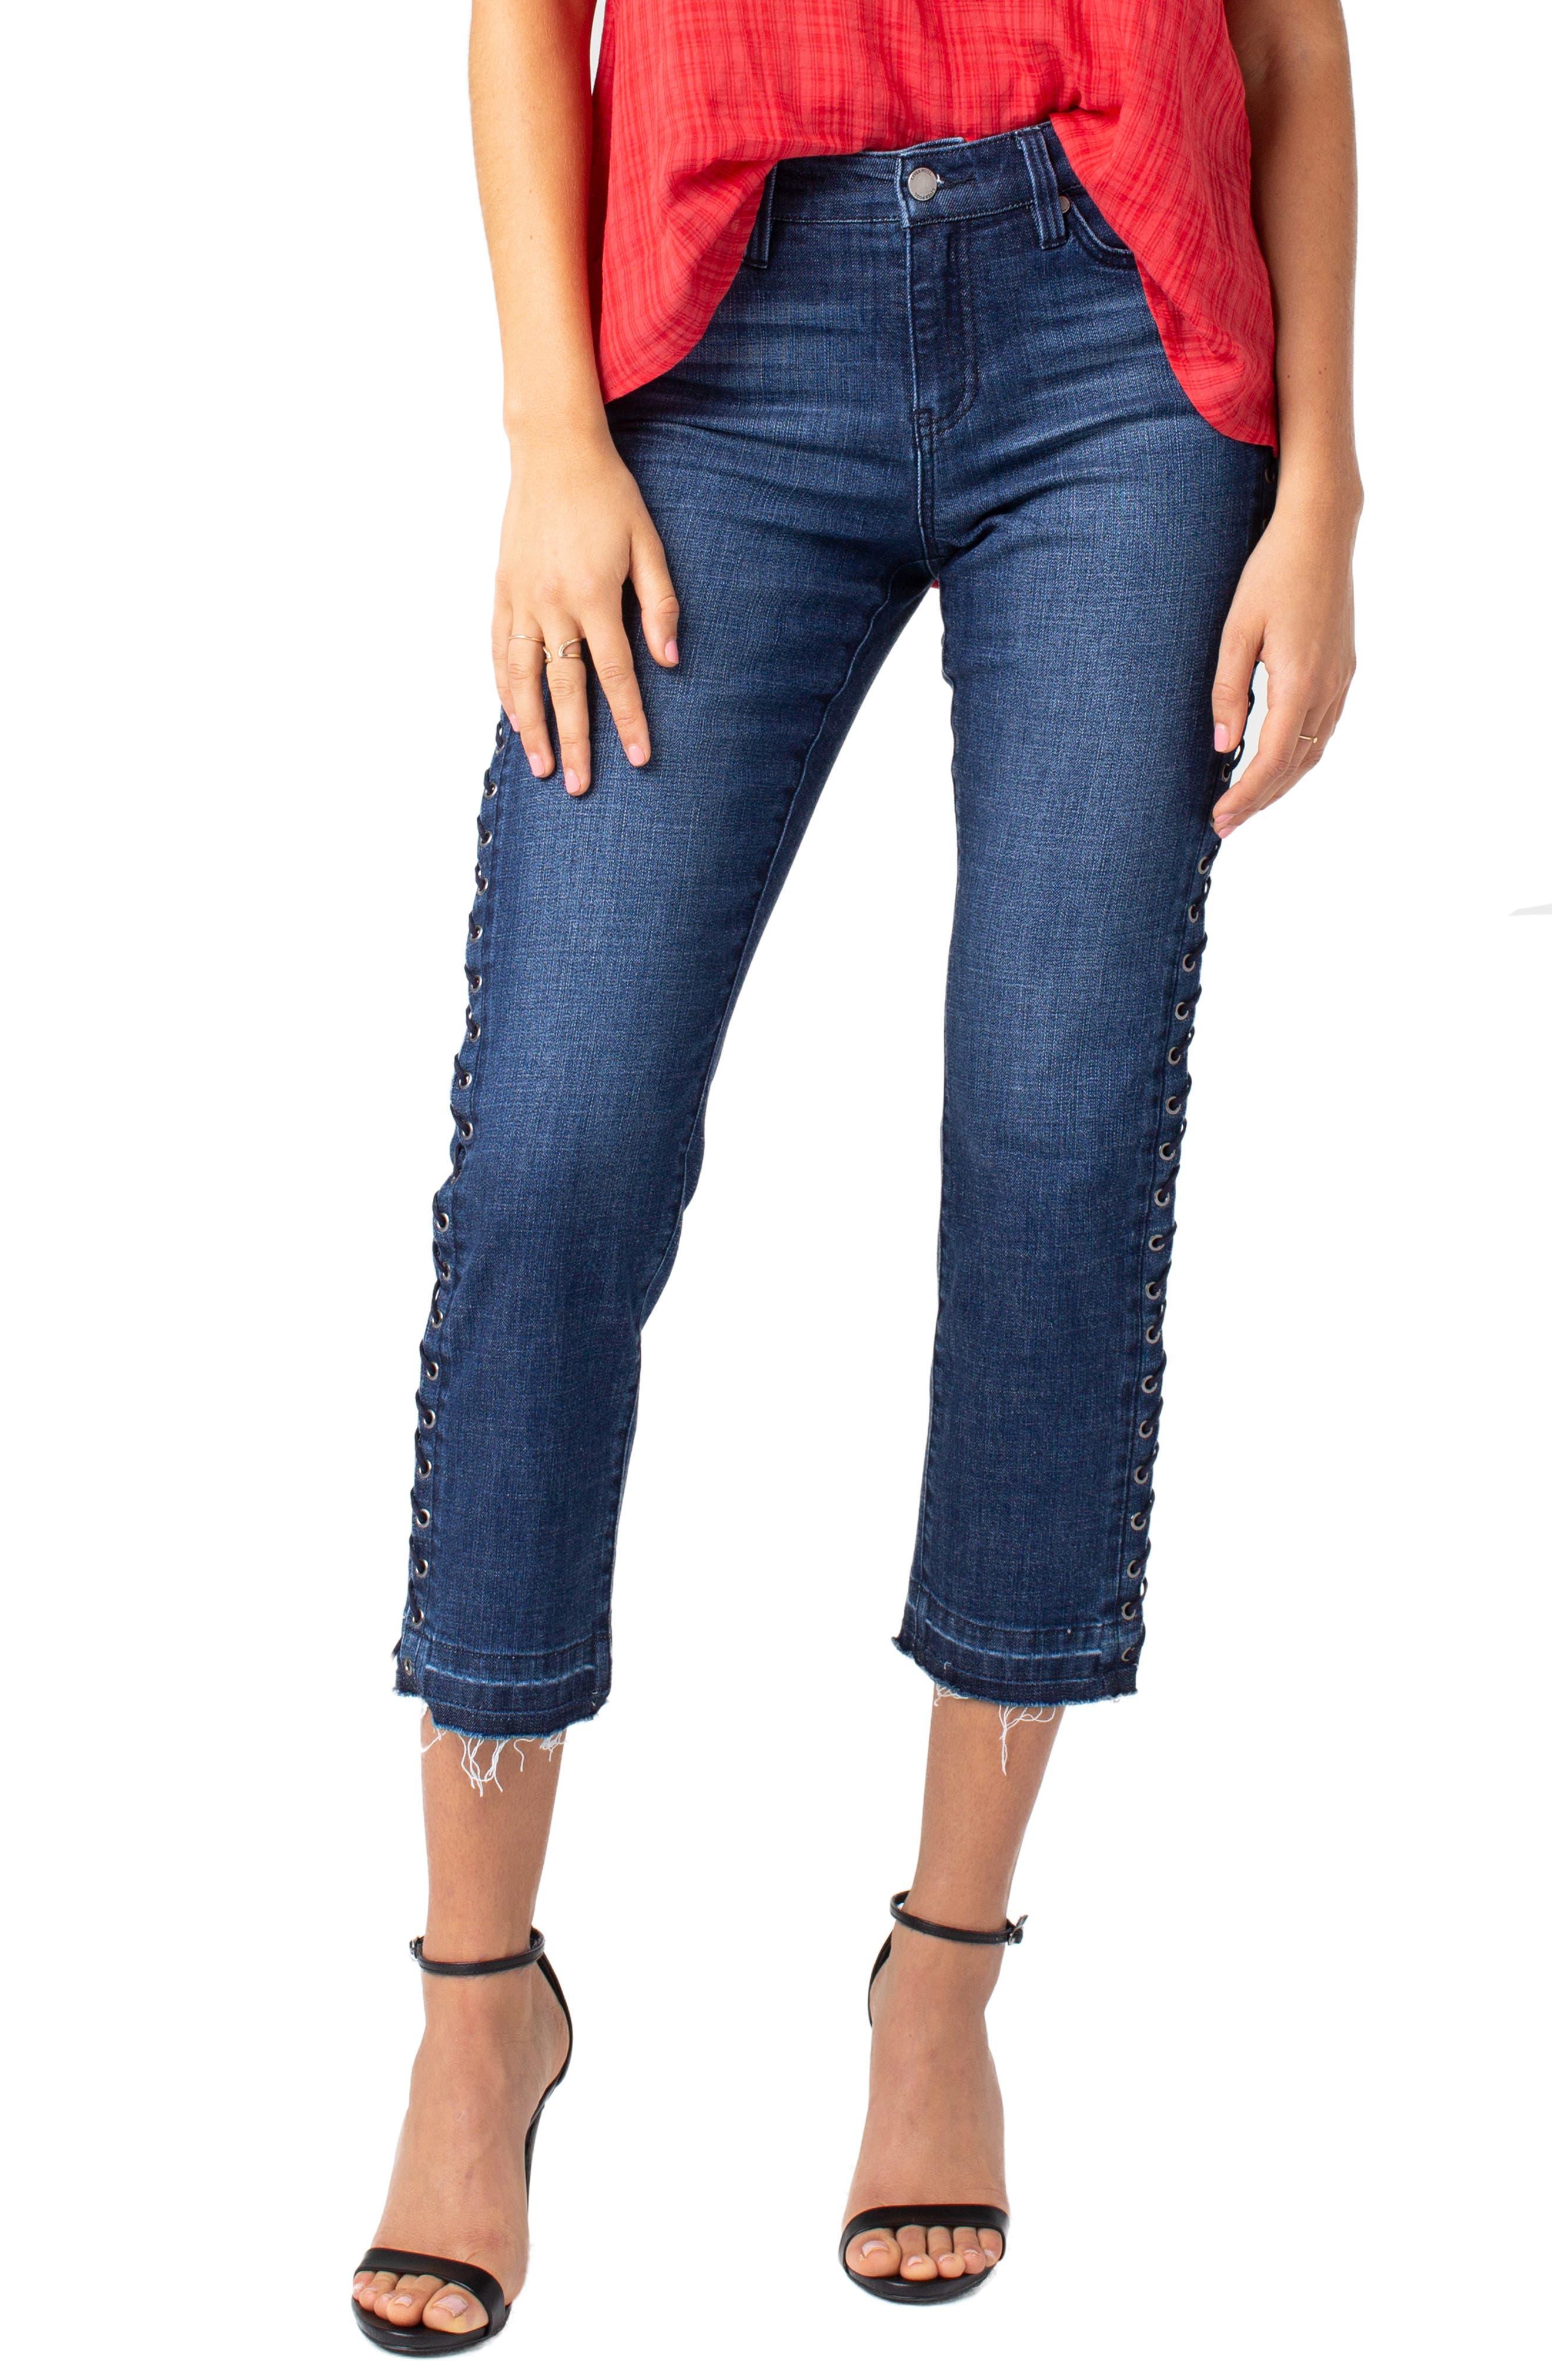 LIVERPOOL Sadie Grommet High Waist Crop Straight Leg Jeans, Main, color, MONTAUK MID BLUE